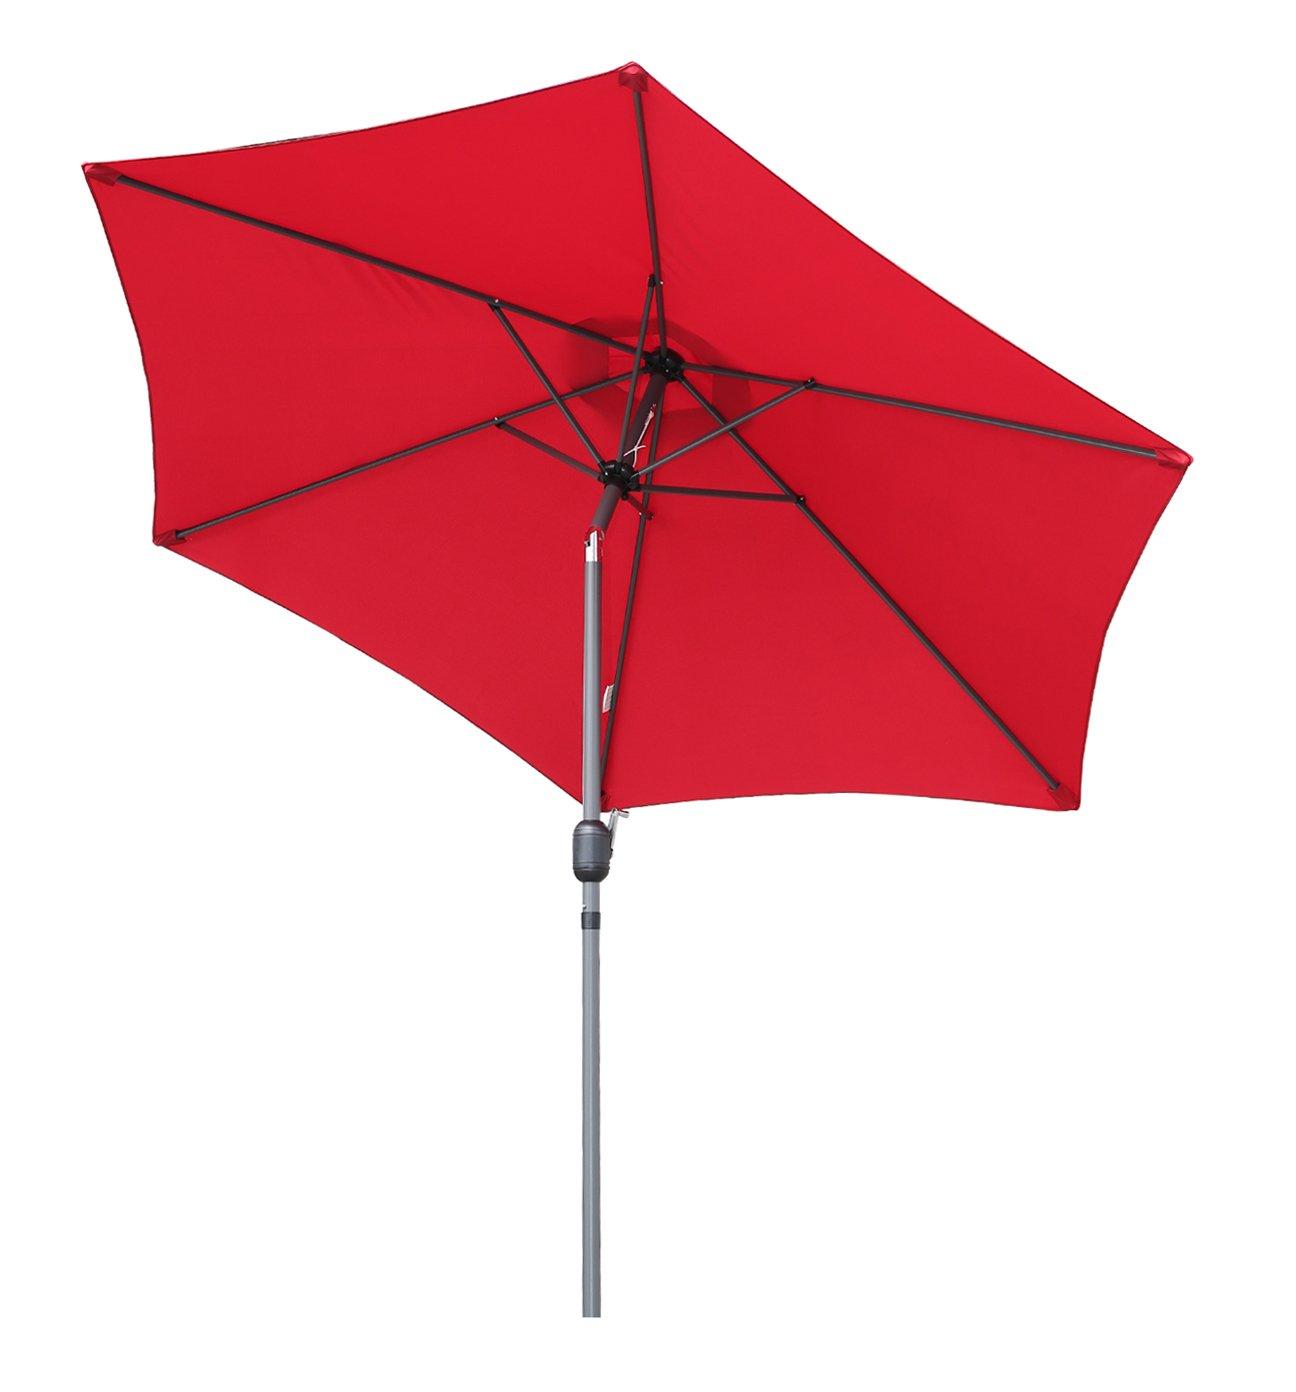 Angel Living Garden Parasol Umbrella 270cm Aluminum with Crank Tilt Mechanism Sun Shade for Garden Patio Furniture (Green)